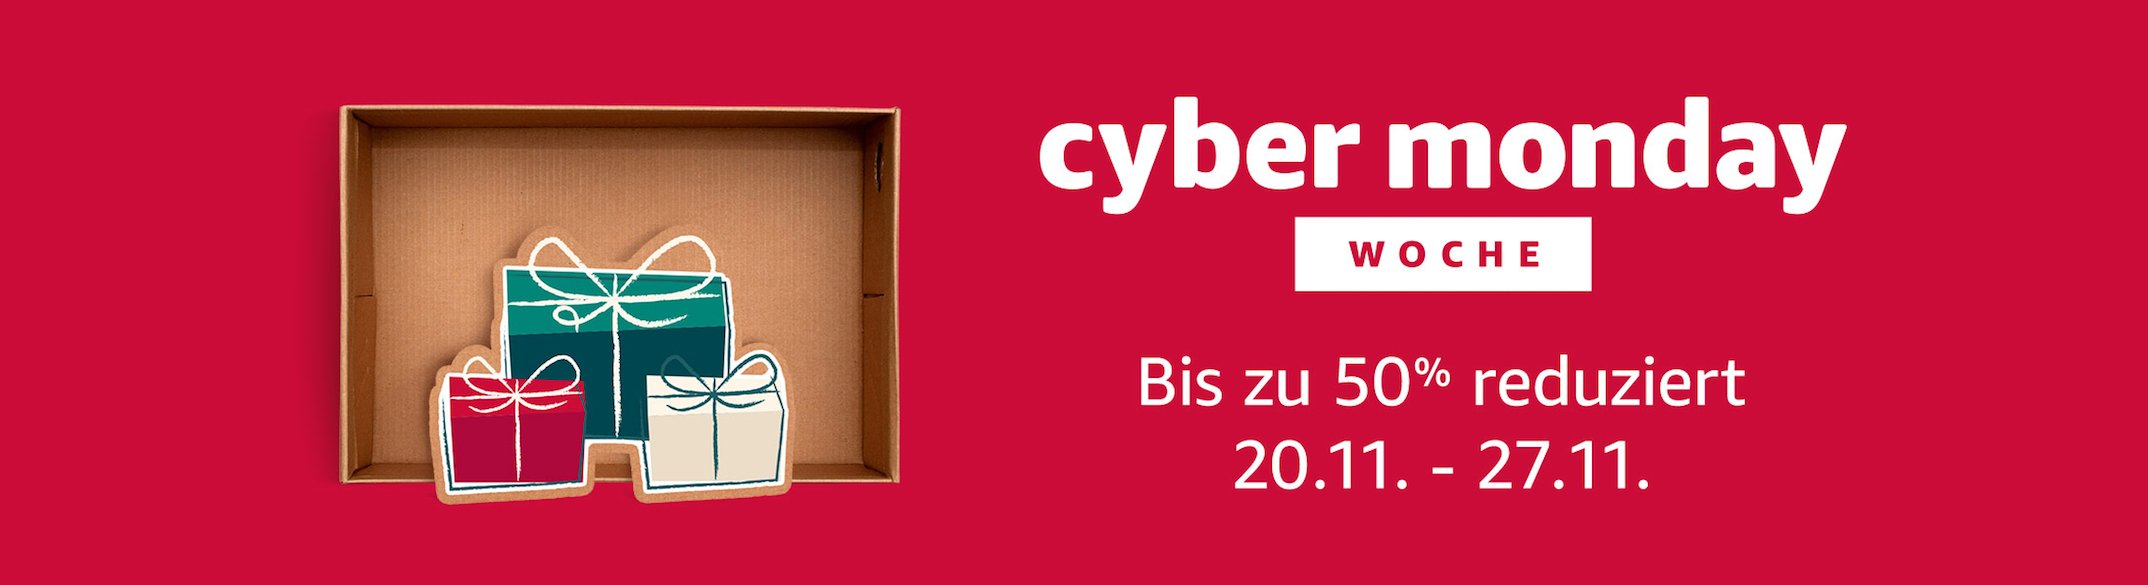 Cyber Monday Woche amazon